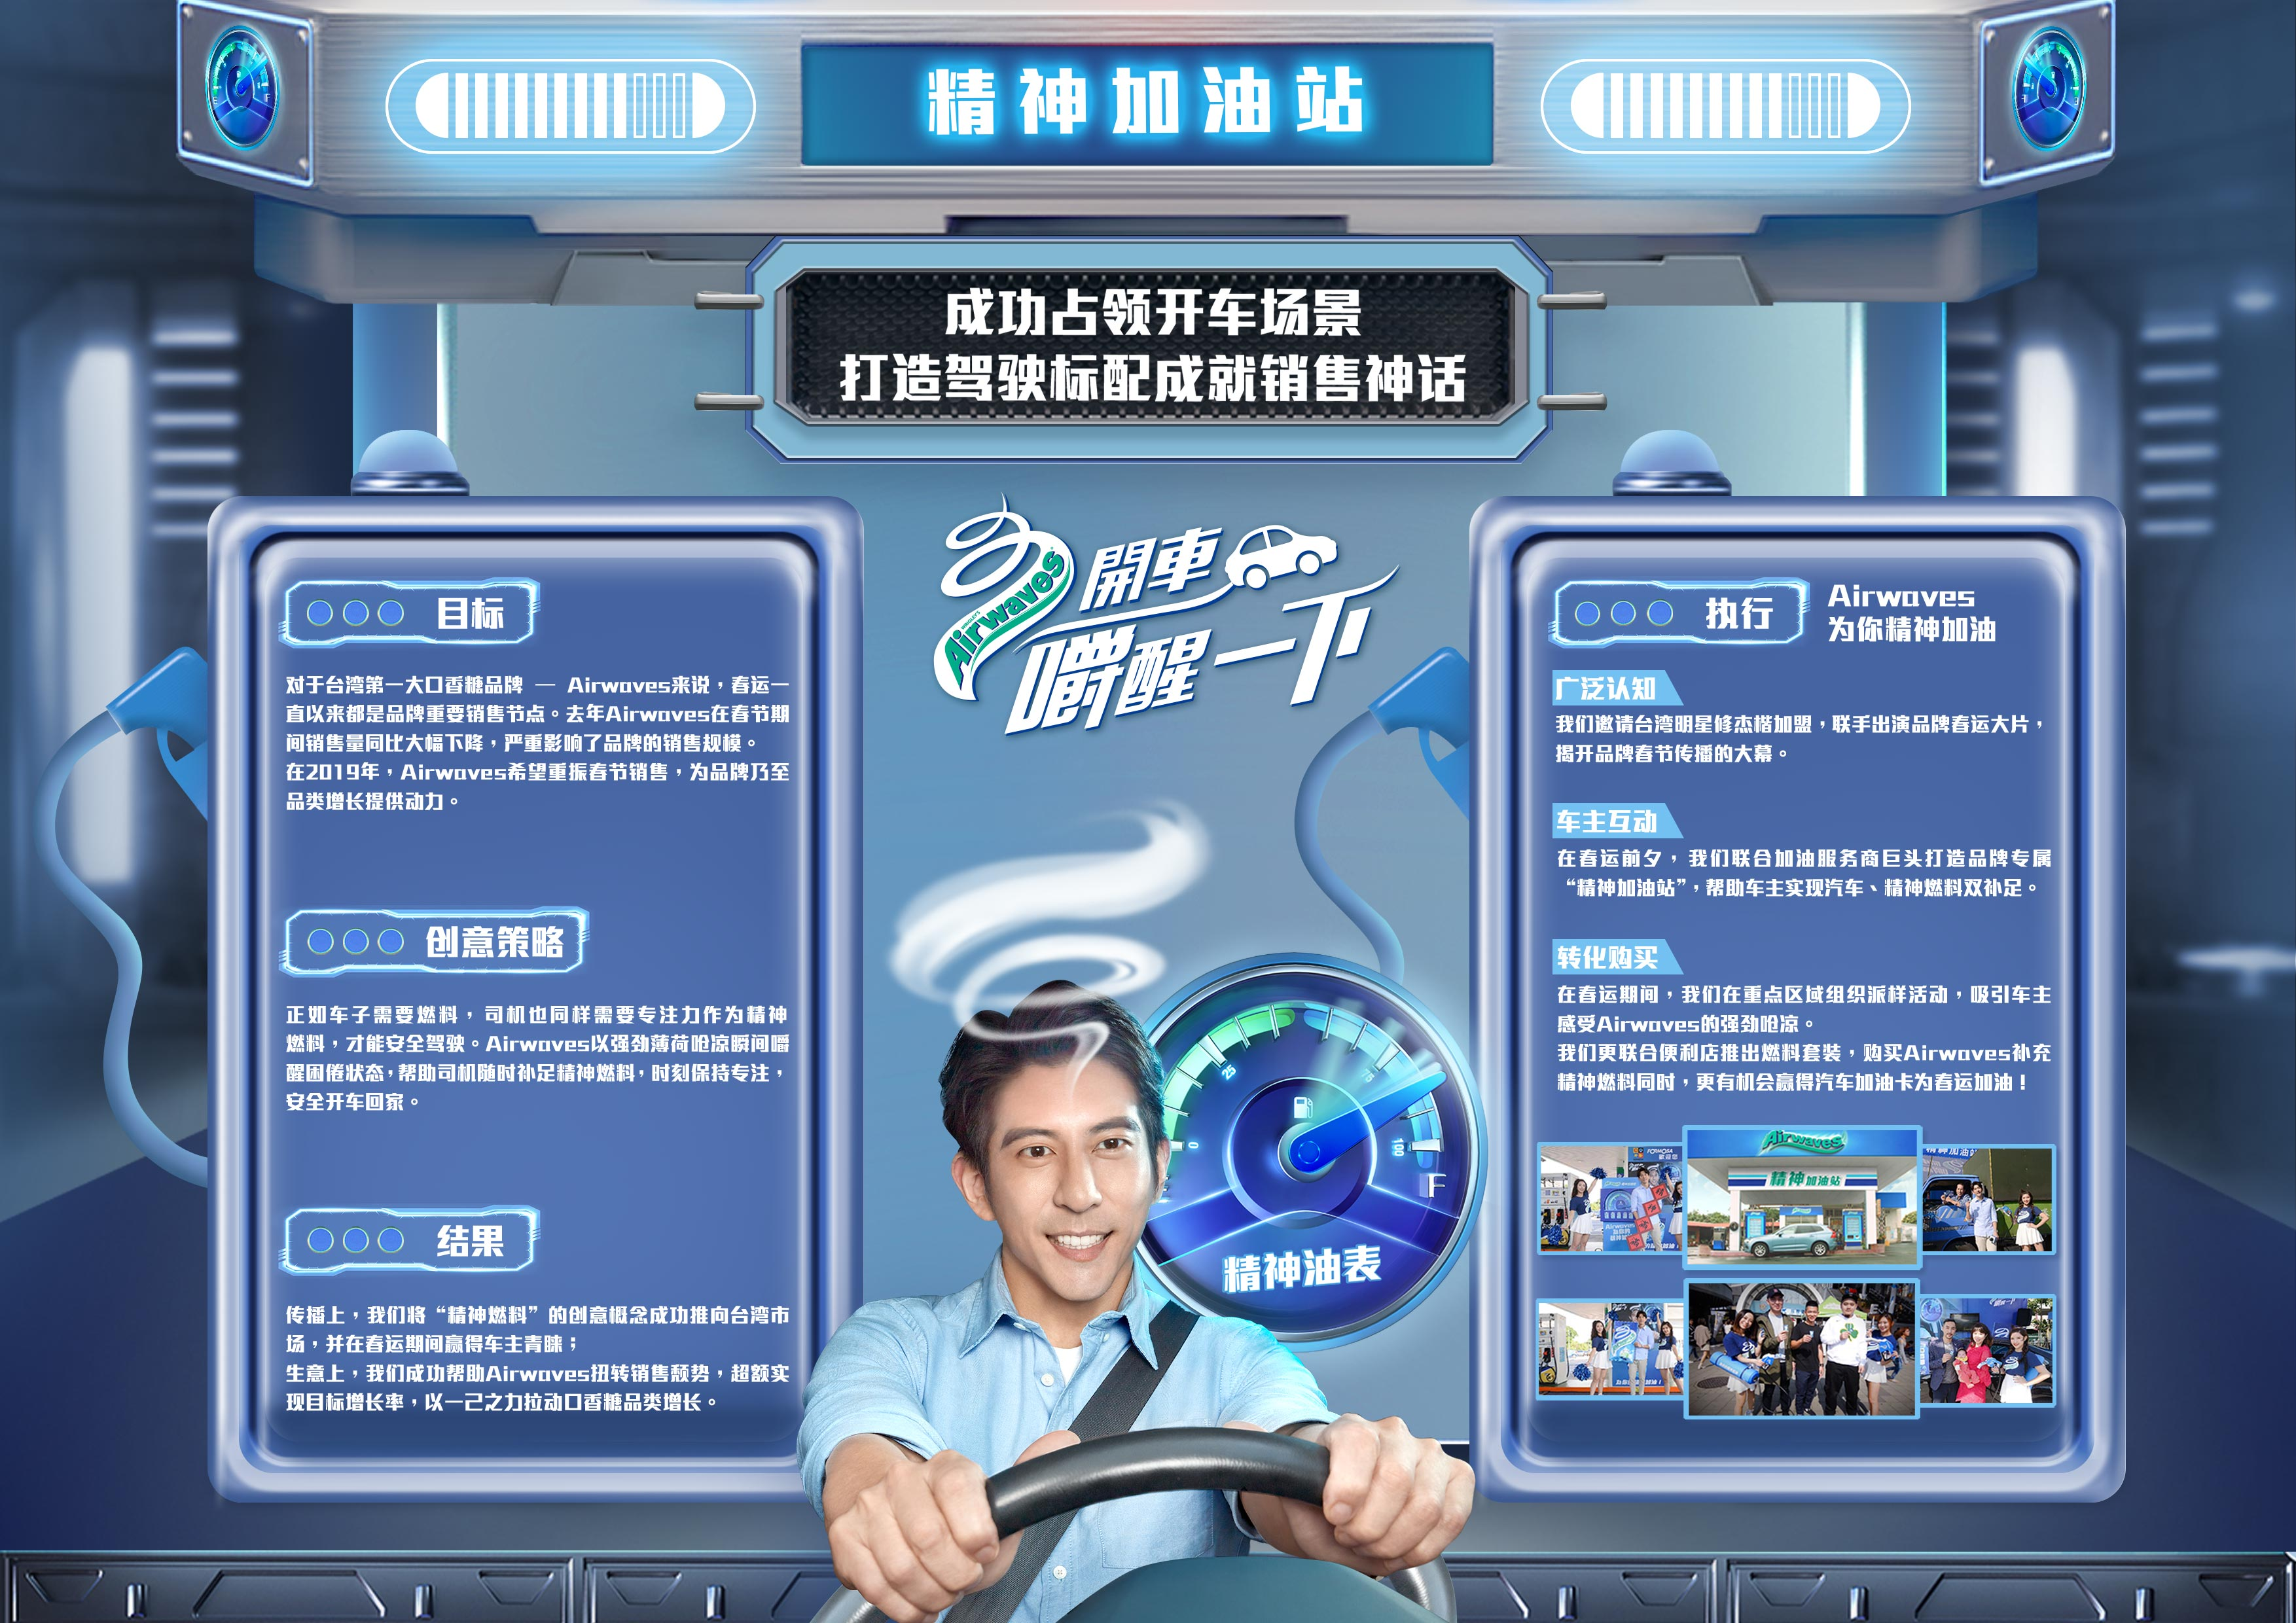 2019_cn_2019_e192-sc-162148921_hero_1